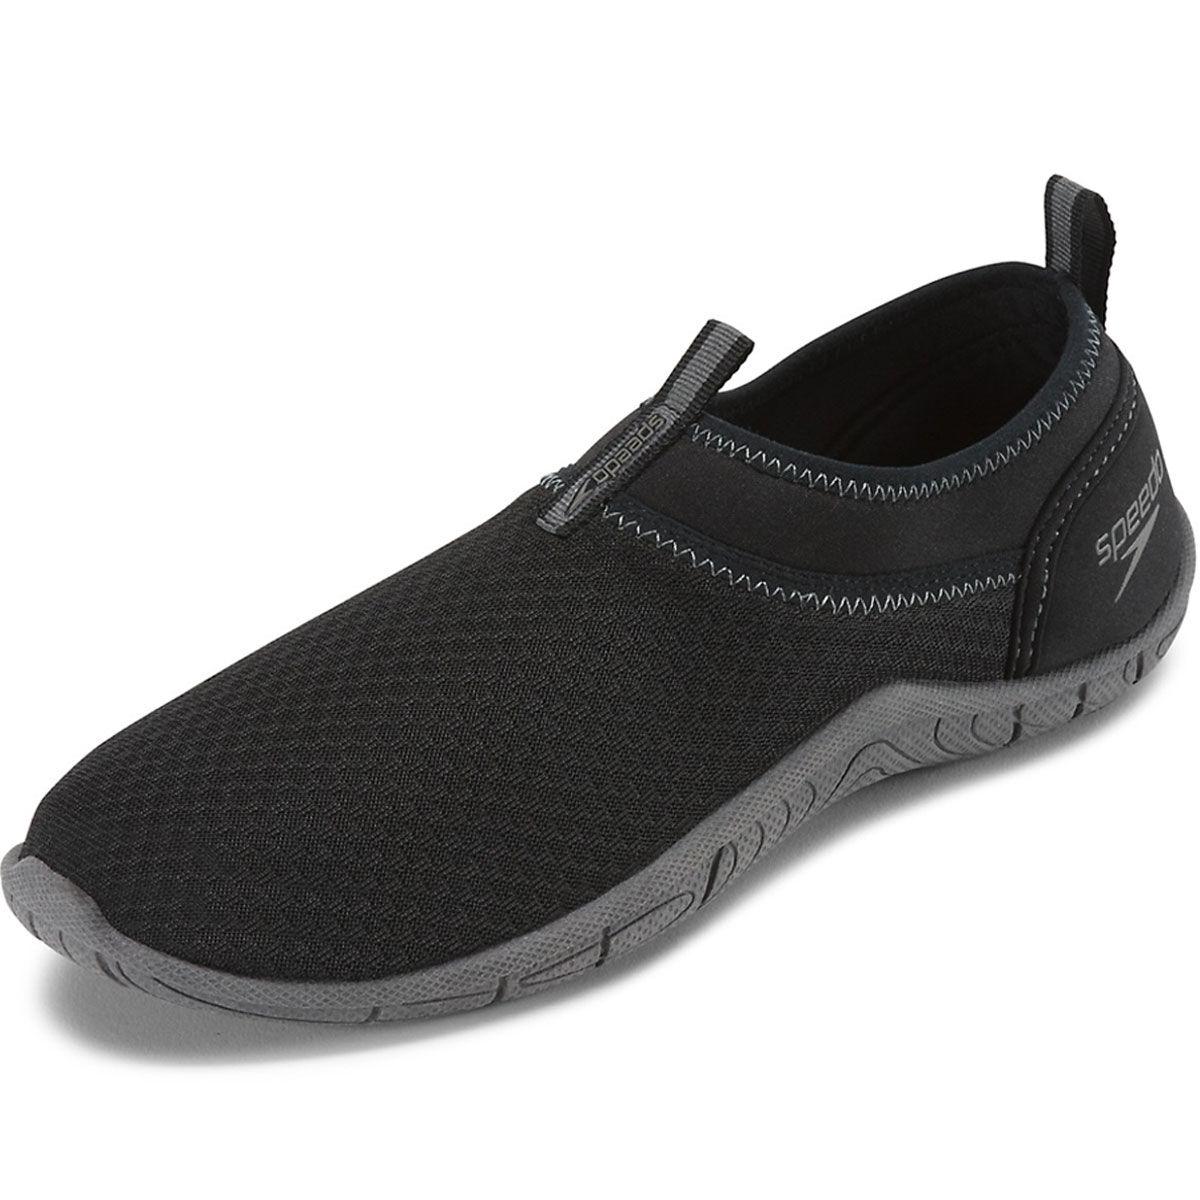 Speedo Men's Tidal Cruiser Water Shoes